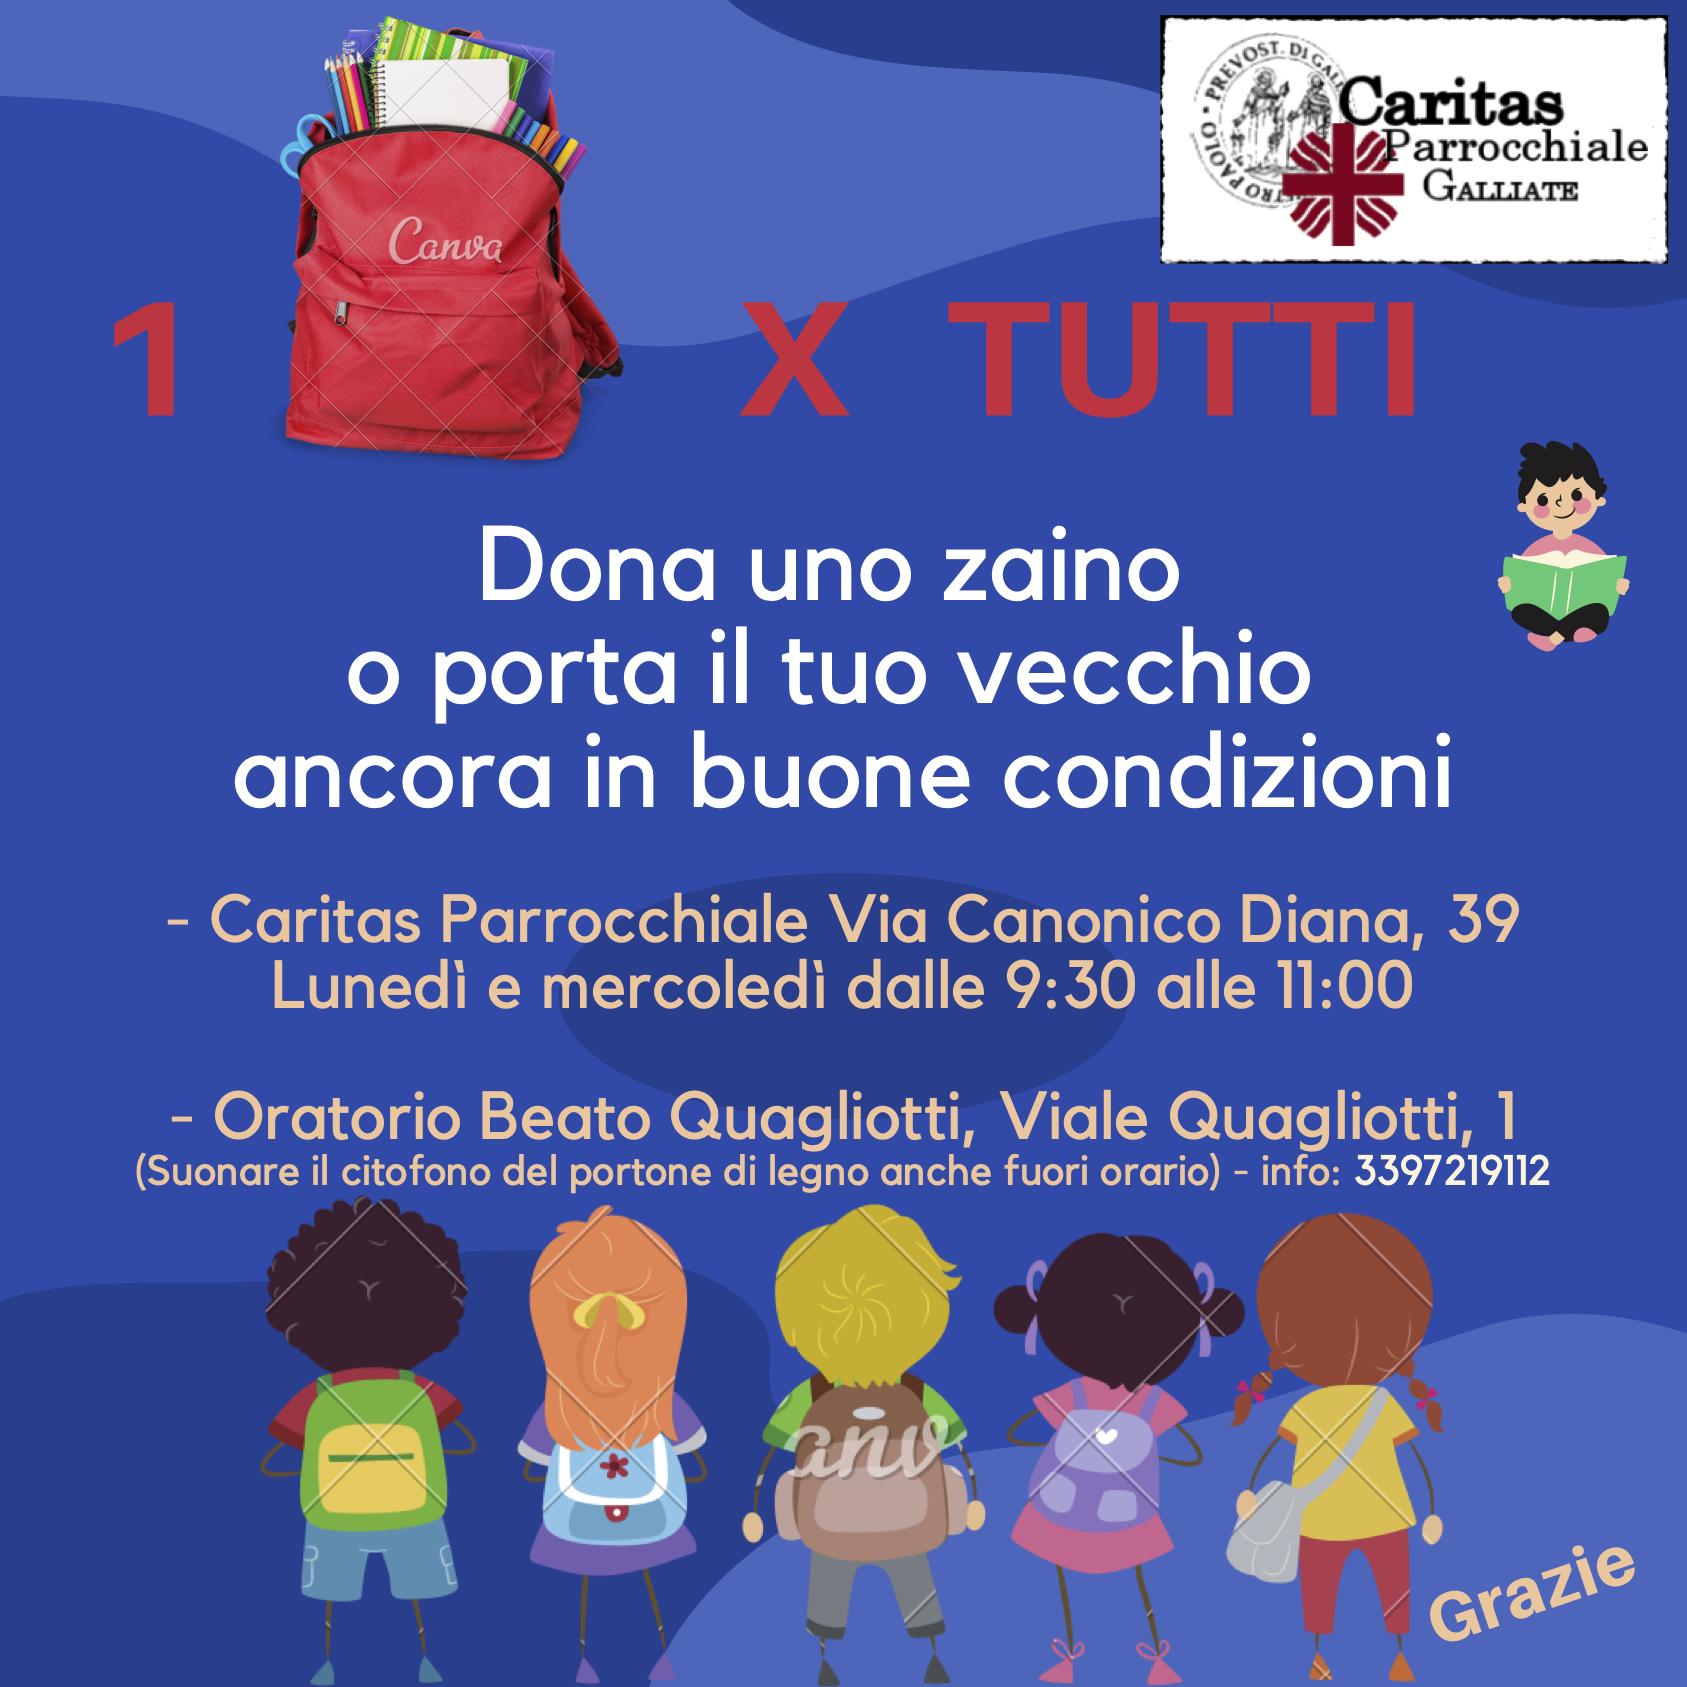 bp210907-ZainoPerTutti-Caritas